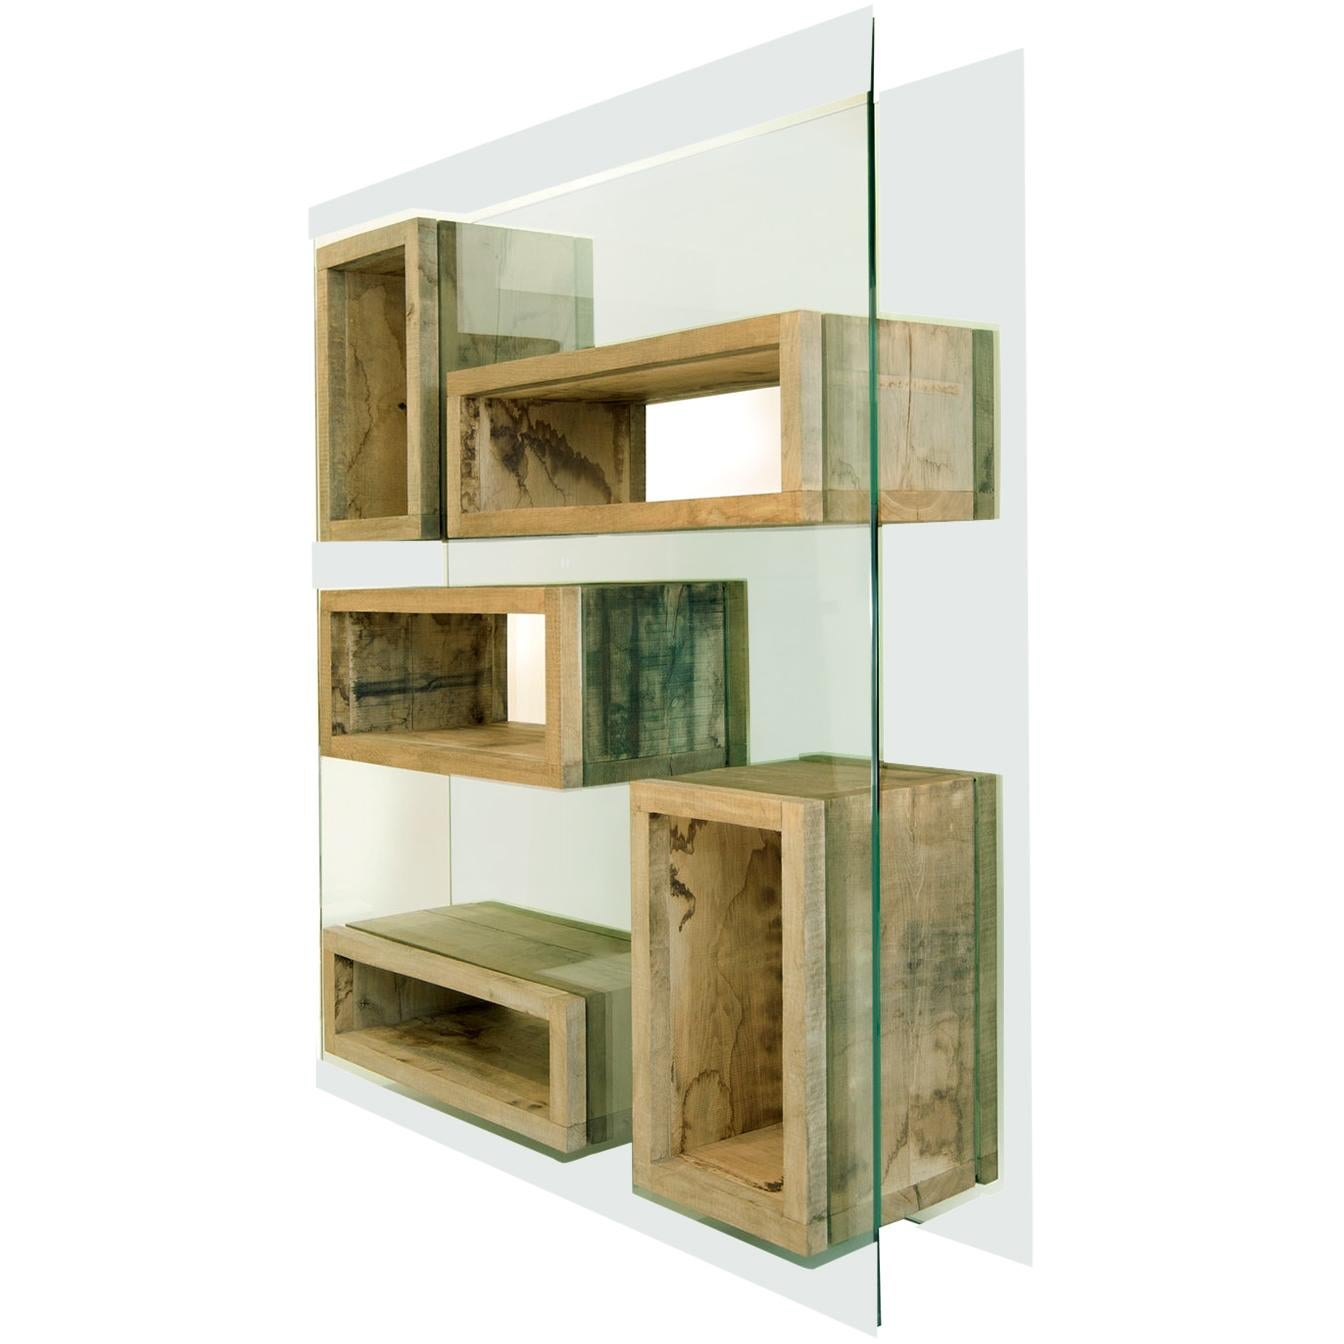 Rossana Orlandi Volumi Sospesi L Bookcase in Wood and Glass by Matteo Casalegno